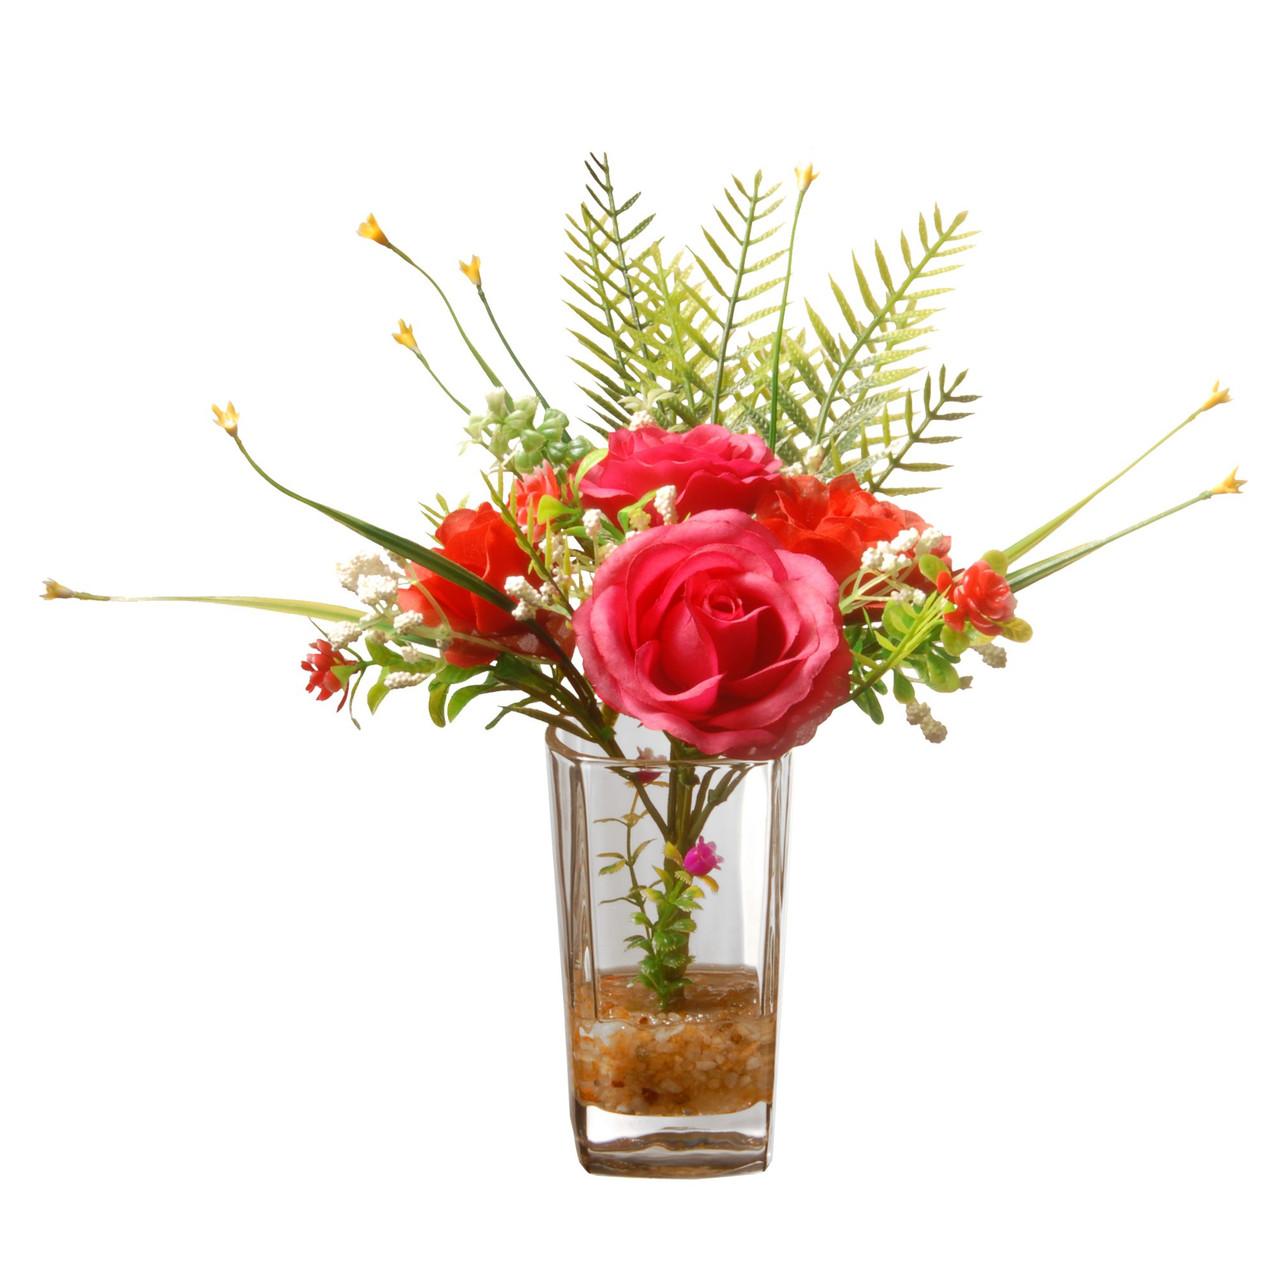 12 Artificial Red Rose Flower Arrangement In Glass Vase Christmas Central